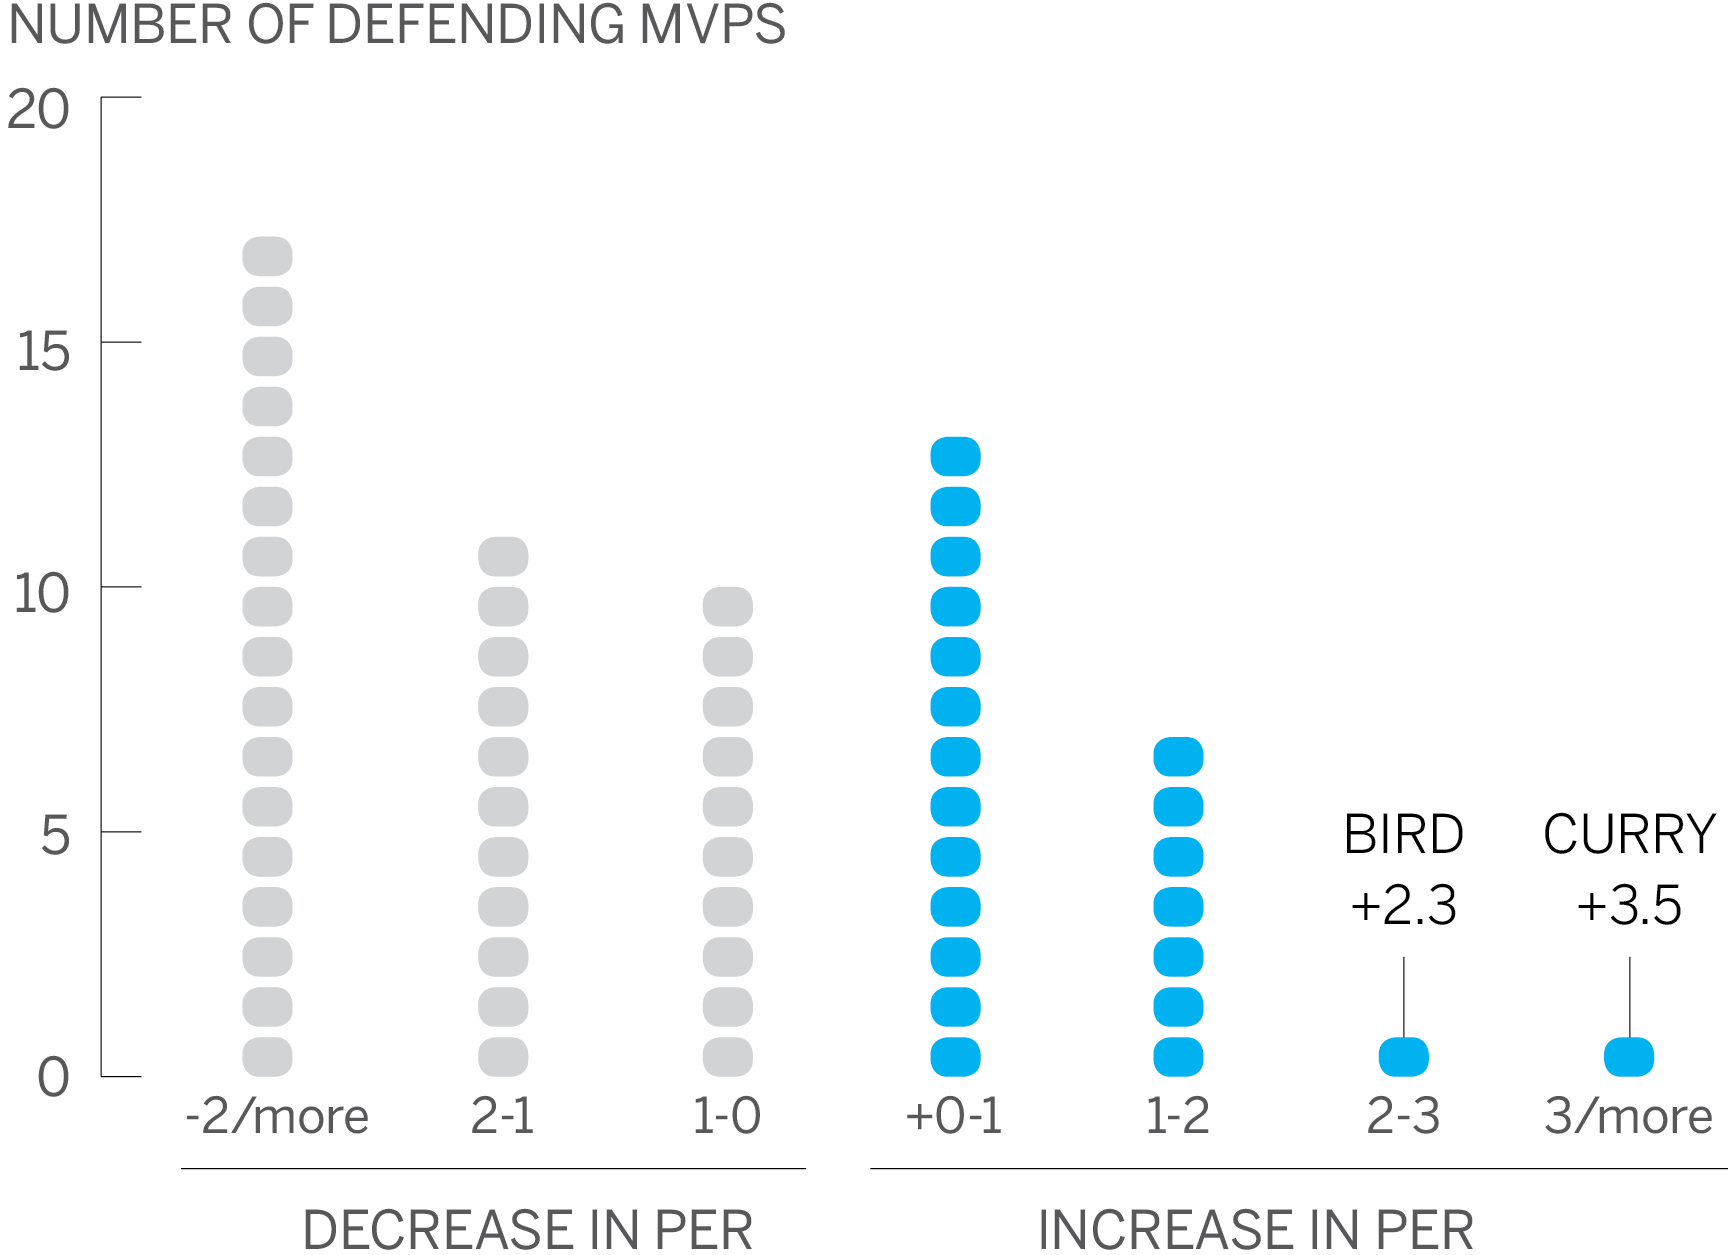 Steph Curry's incredible MVP season